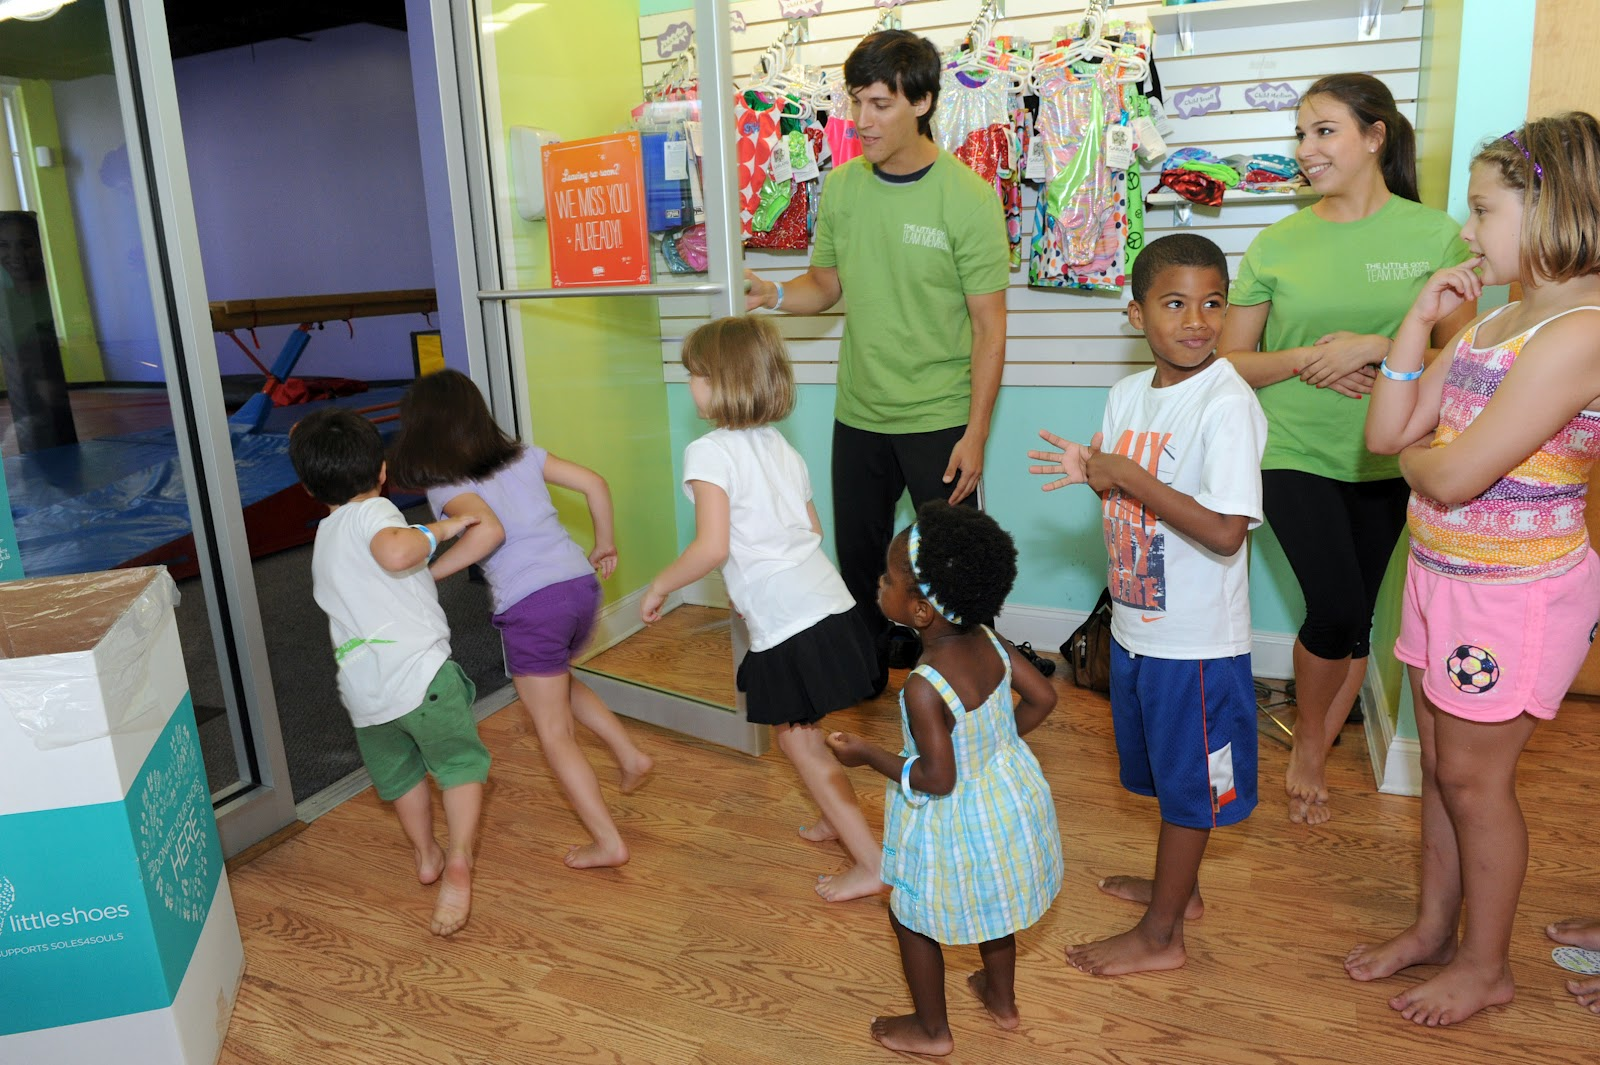 Harlem Lovebirds: The Little Gym Announces Its Big Hearts, Little ...